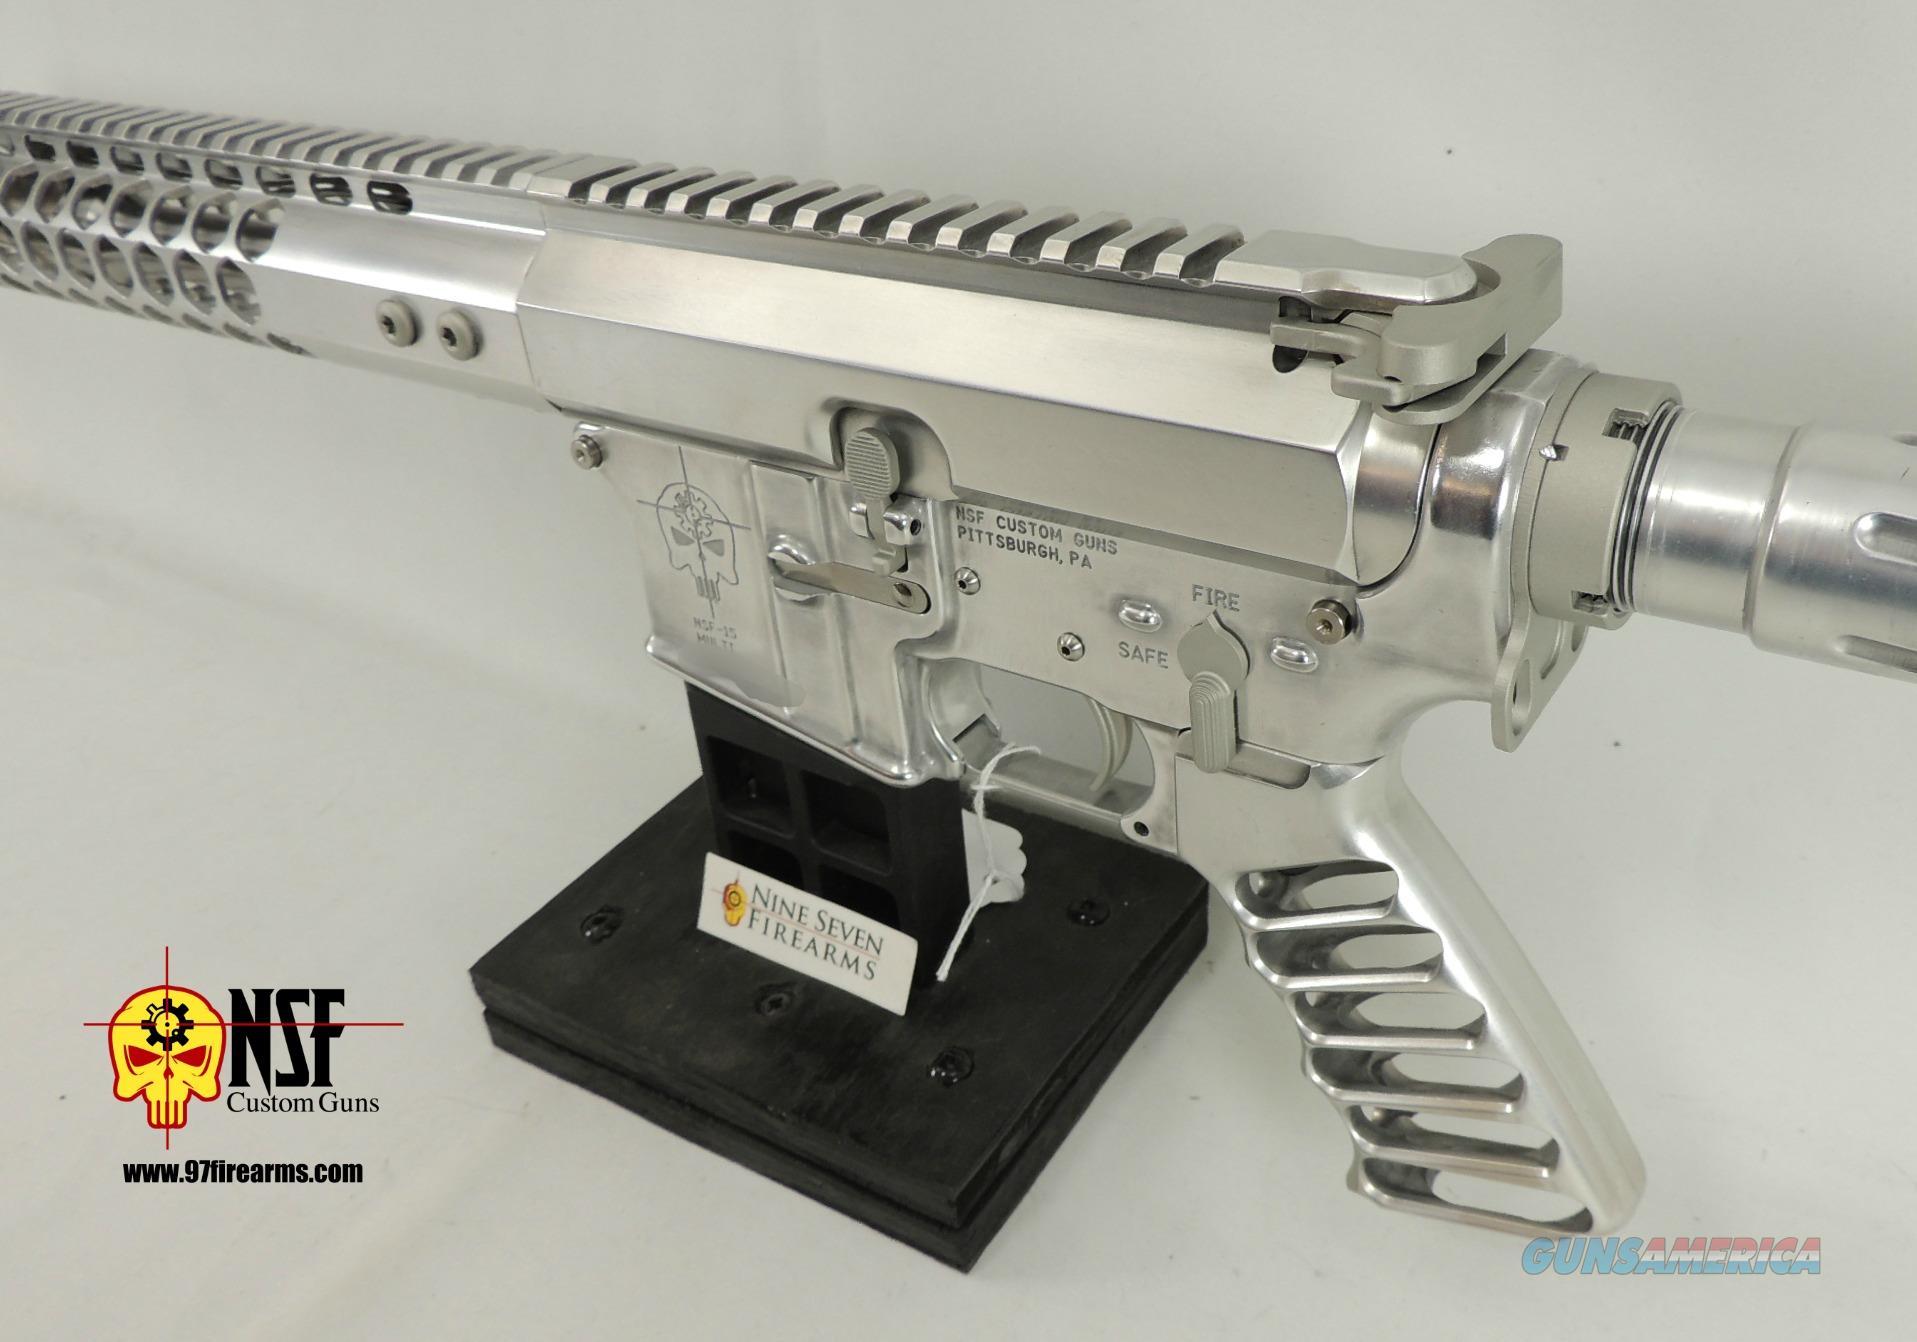 Polished Aluminum AR-15, Nickel BCG, SS Barrel, NSF Custom Guns